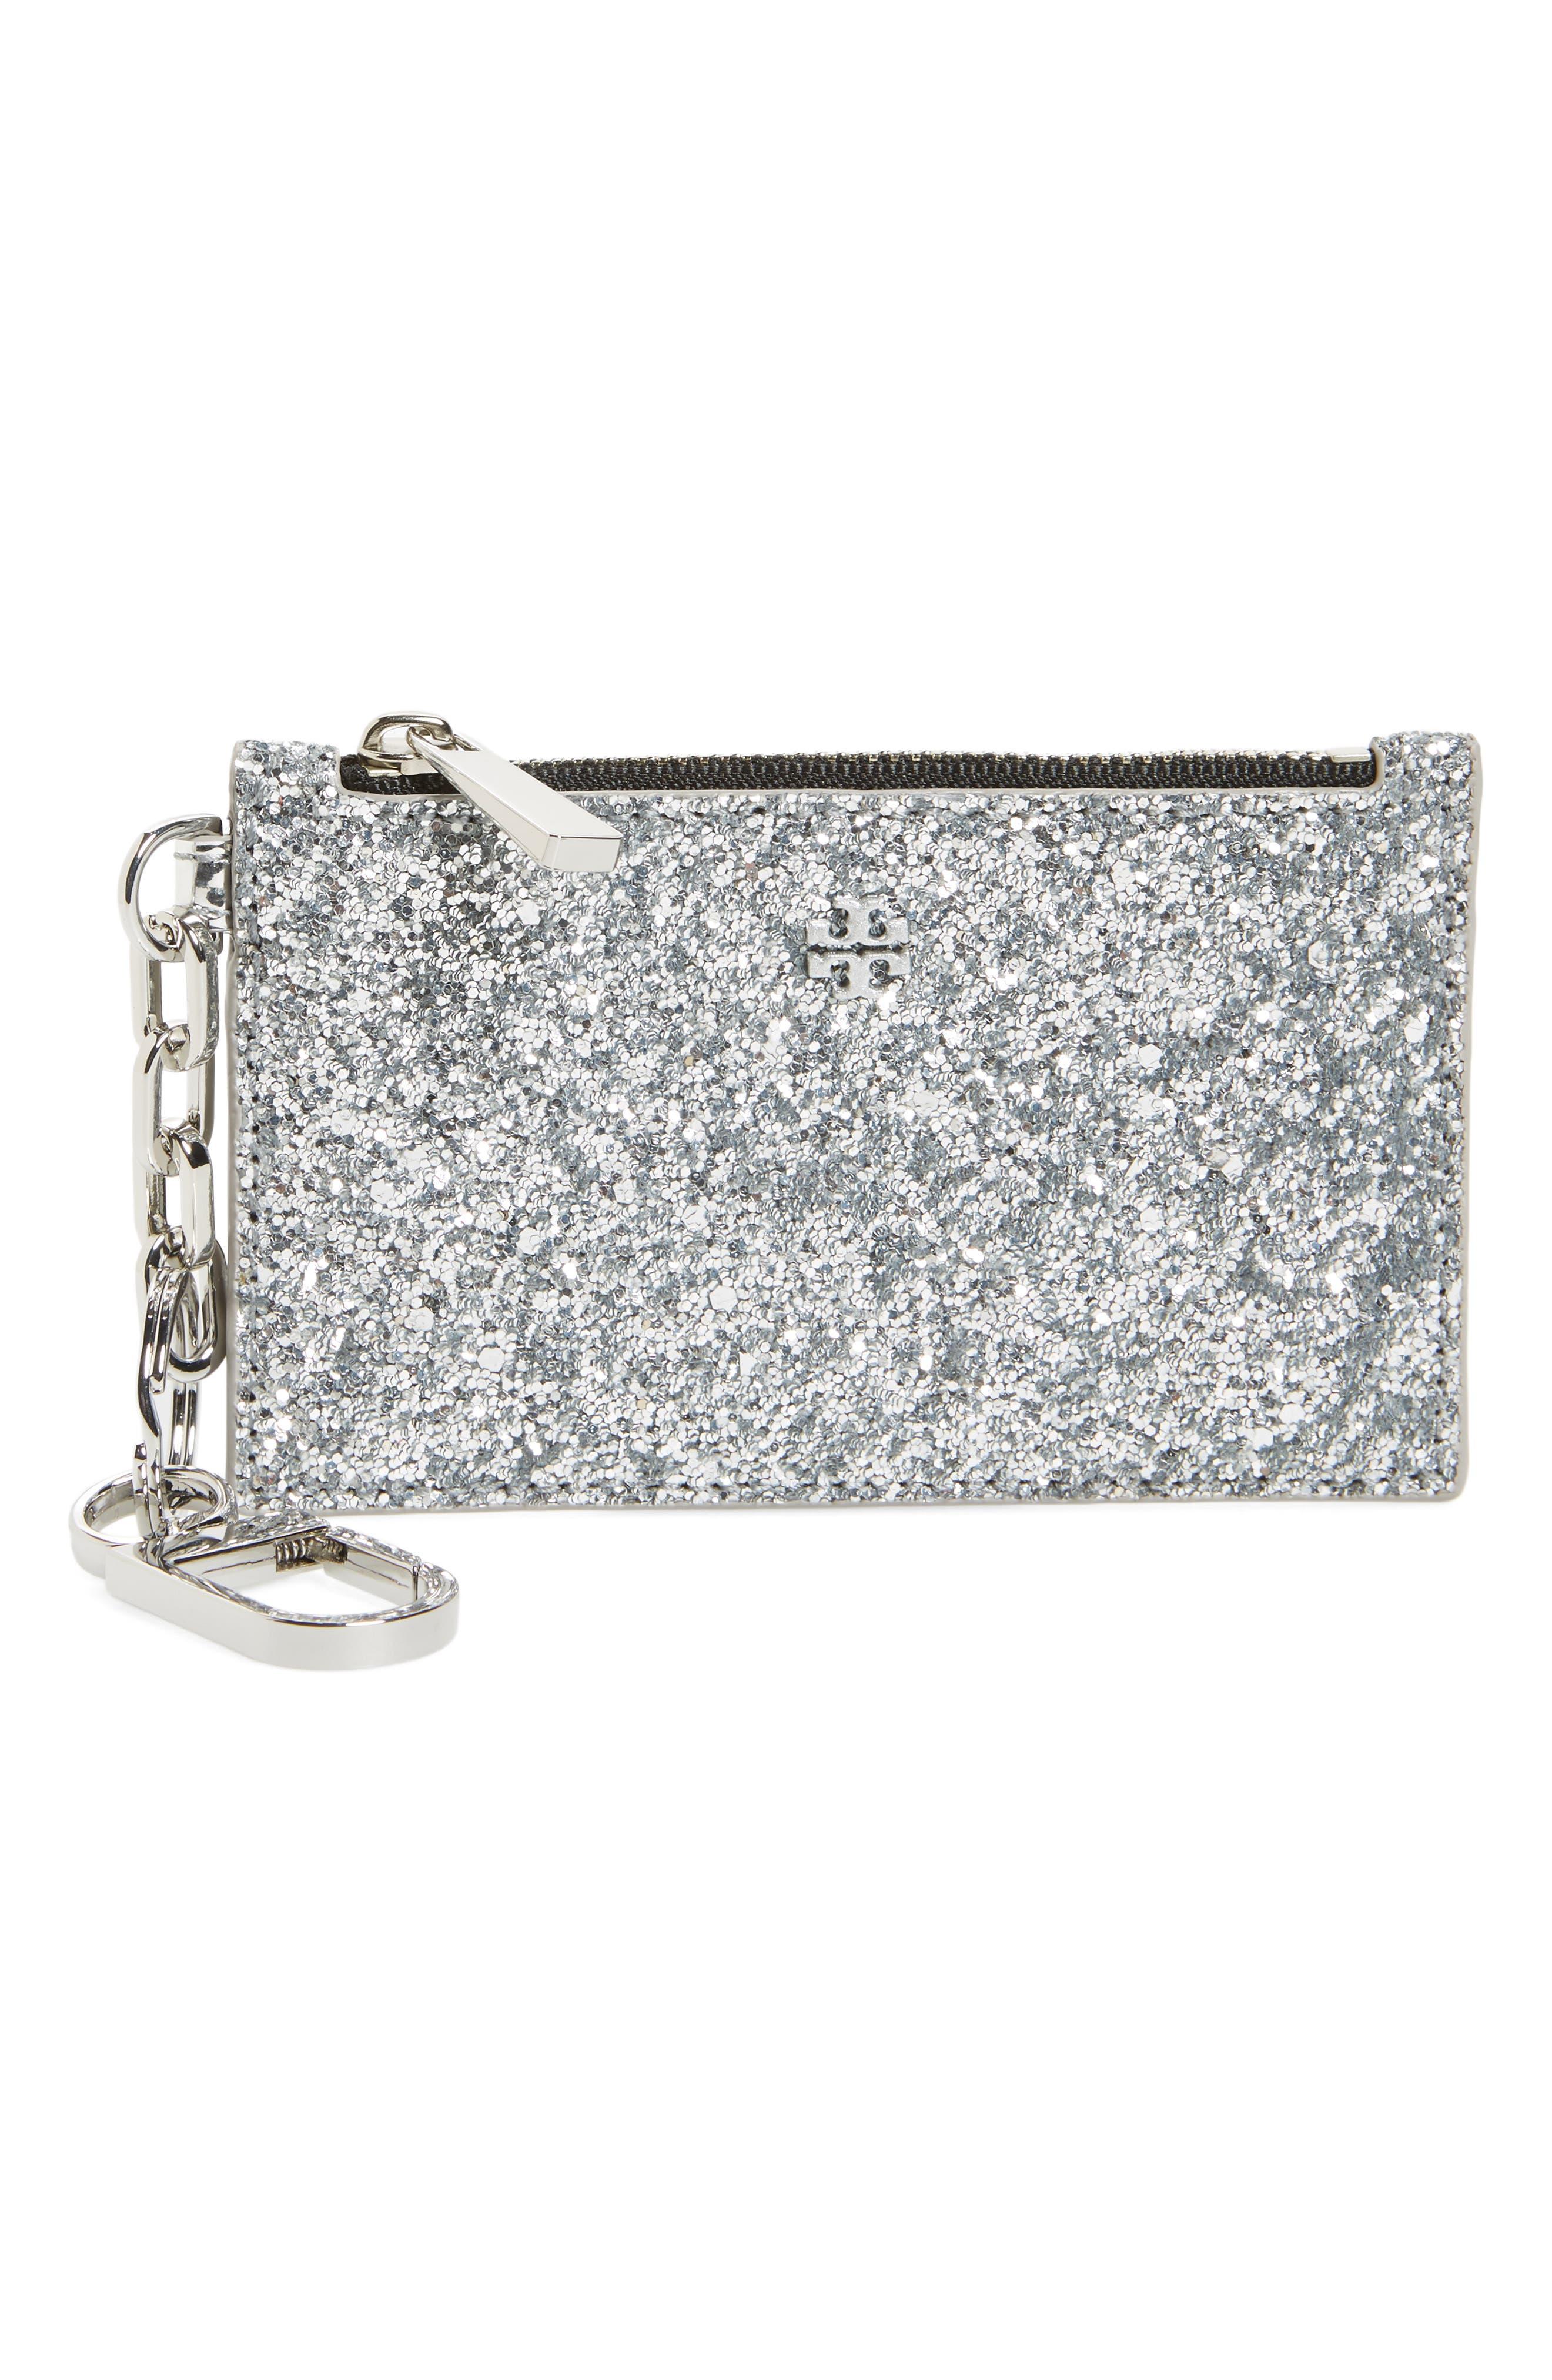 Robinson Glitter Card Case with Key Chain,                             Main thumbnail 1, color,                             Silver Glitter